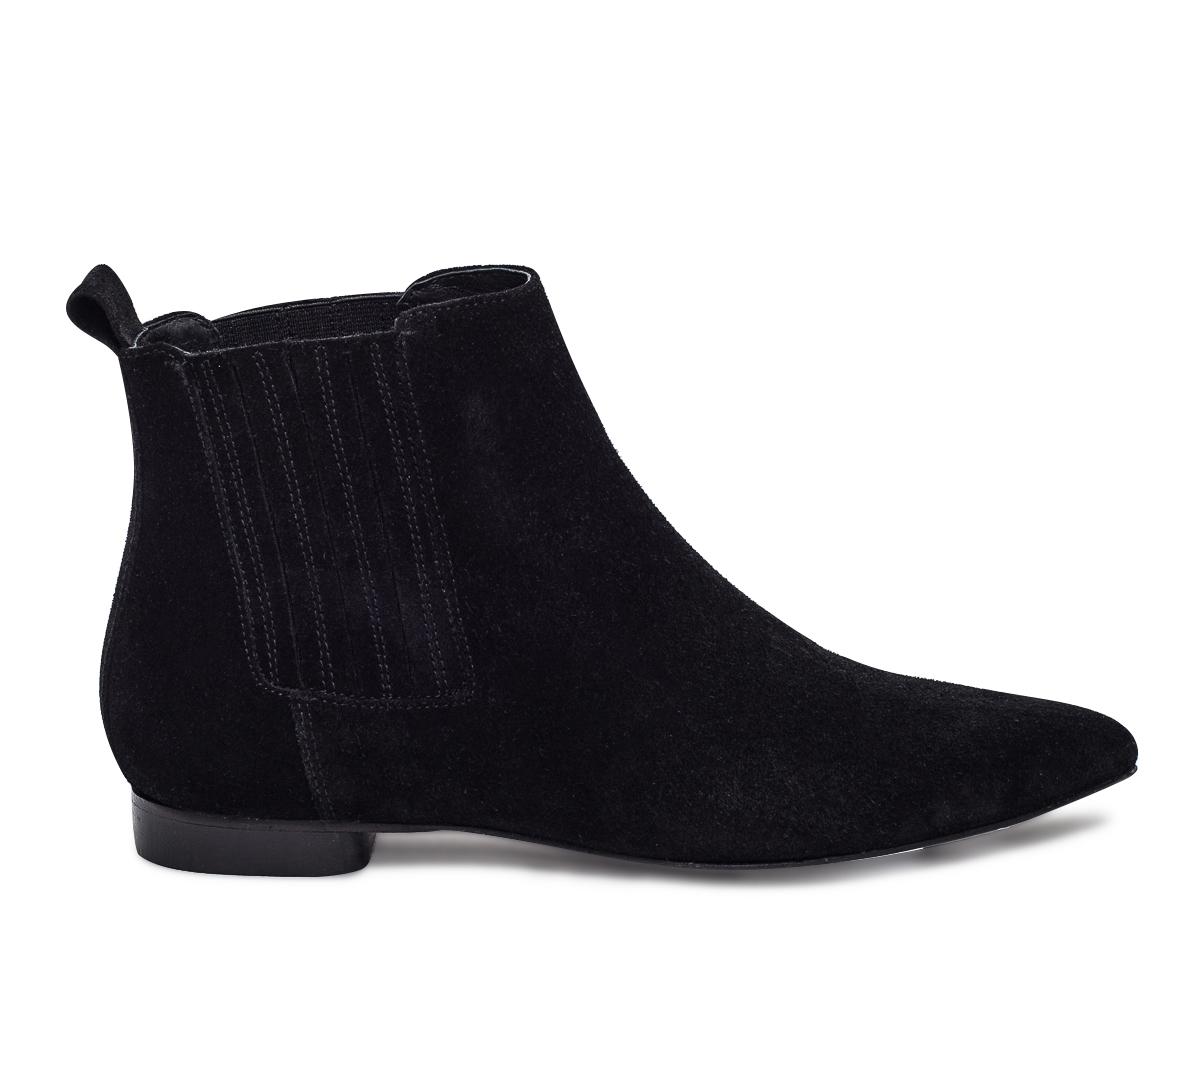 Eram De Croûte Noir Boots En Cuir OZuTiPXk